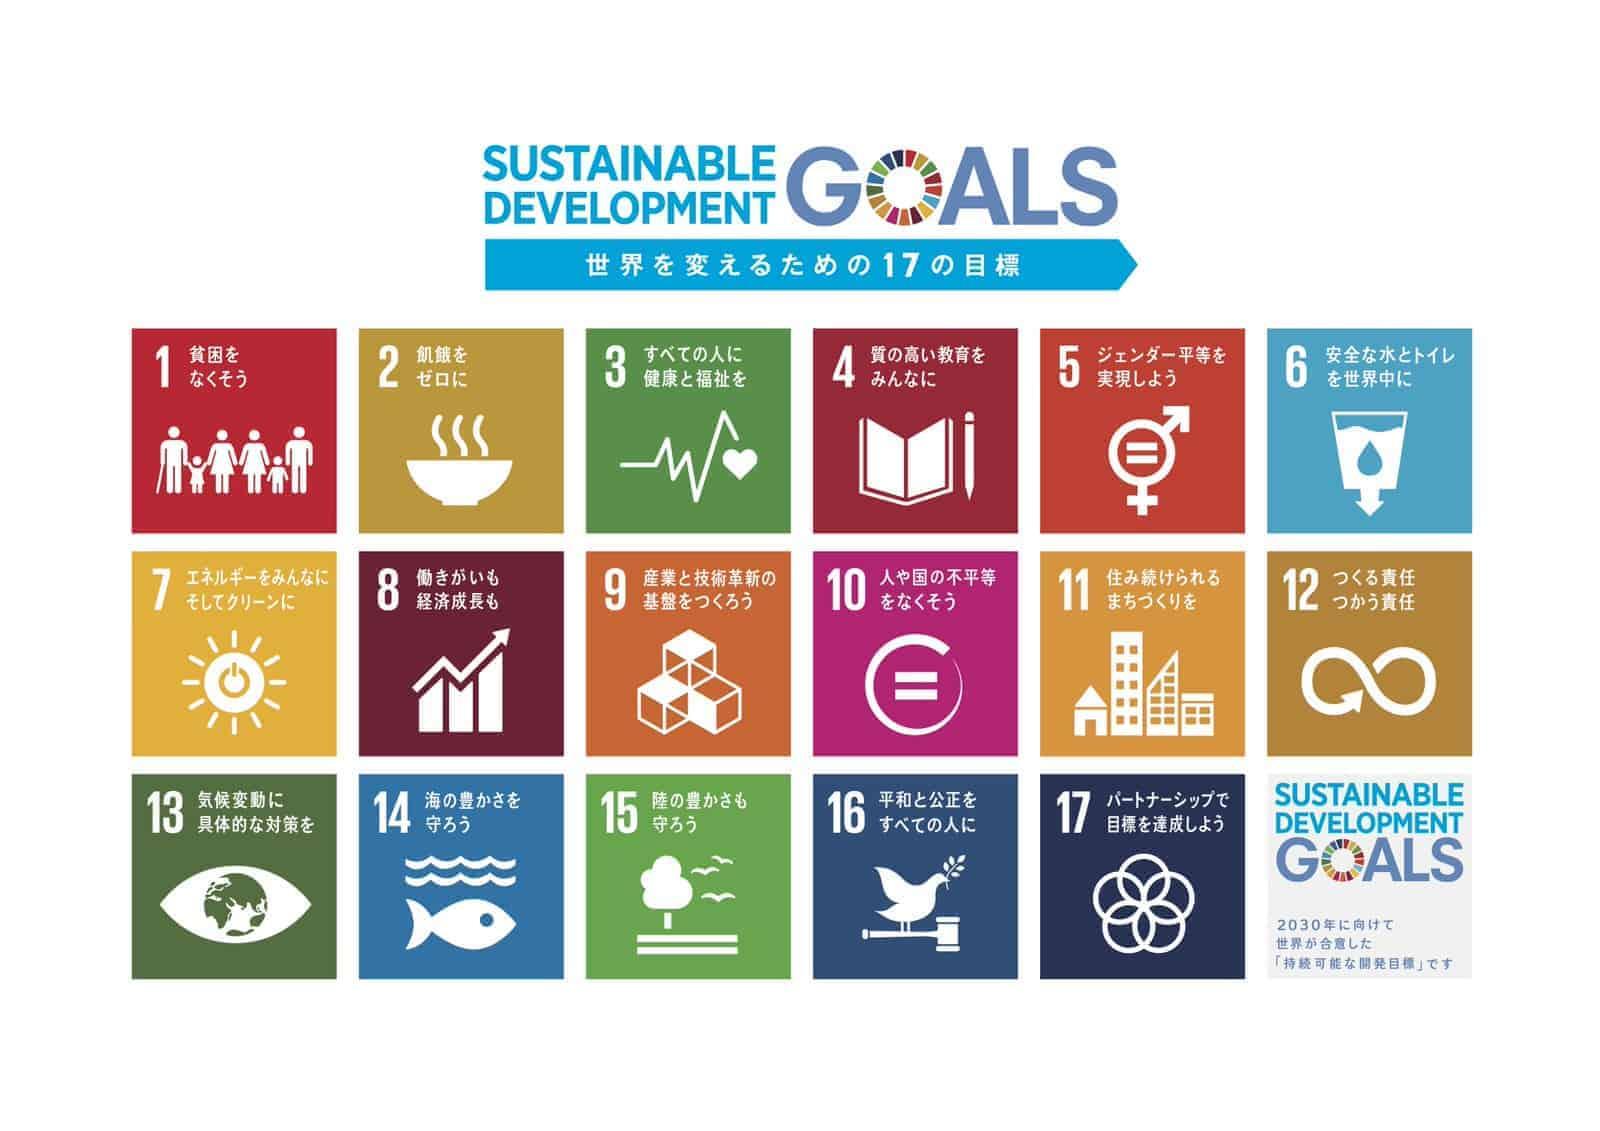 sdg logo ja 1 - 2017年橋本ゼミのテーマは、SDGs(持続可能な開発目標)です